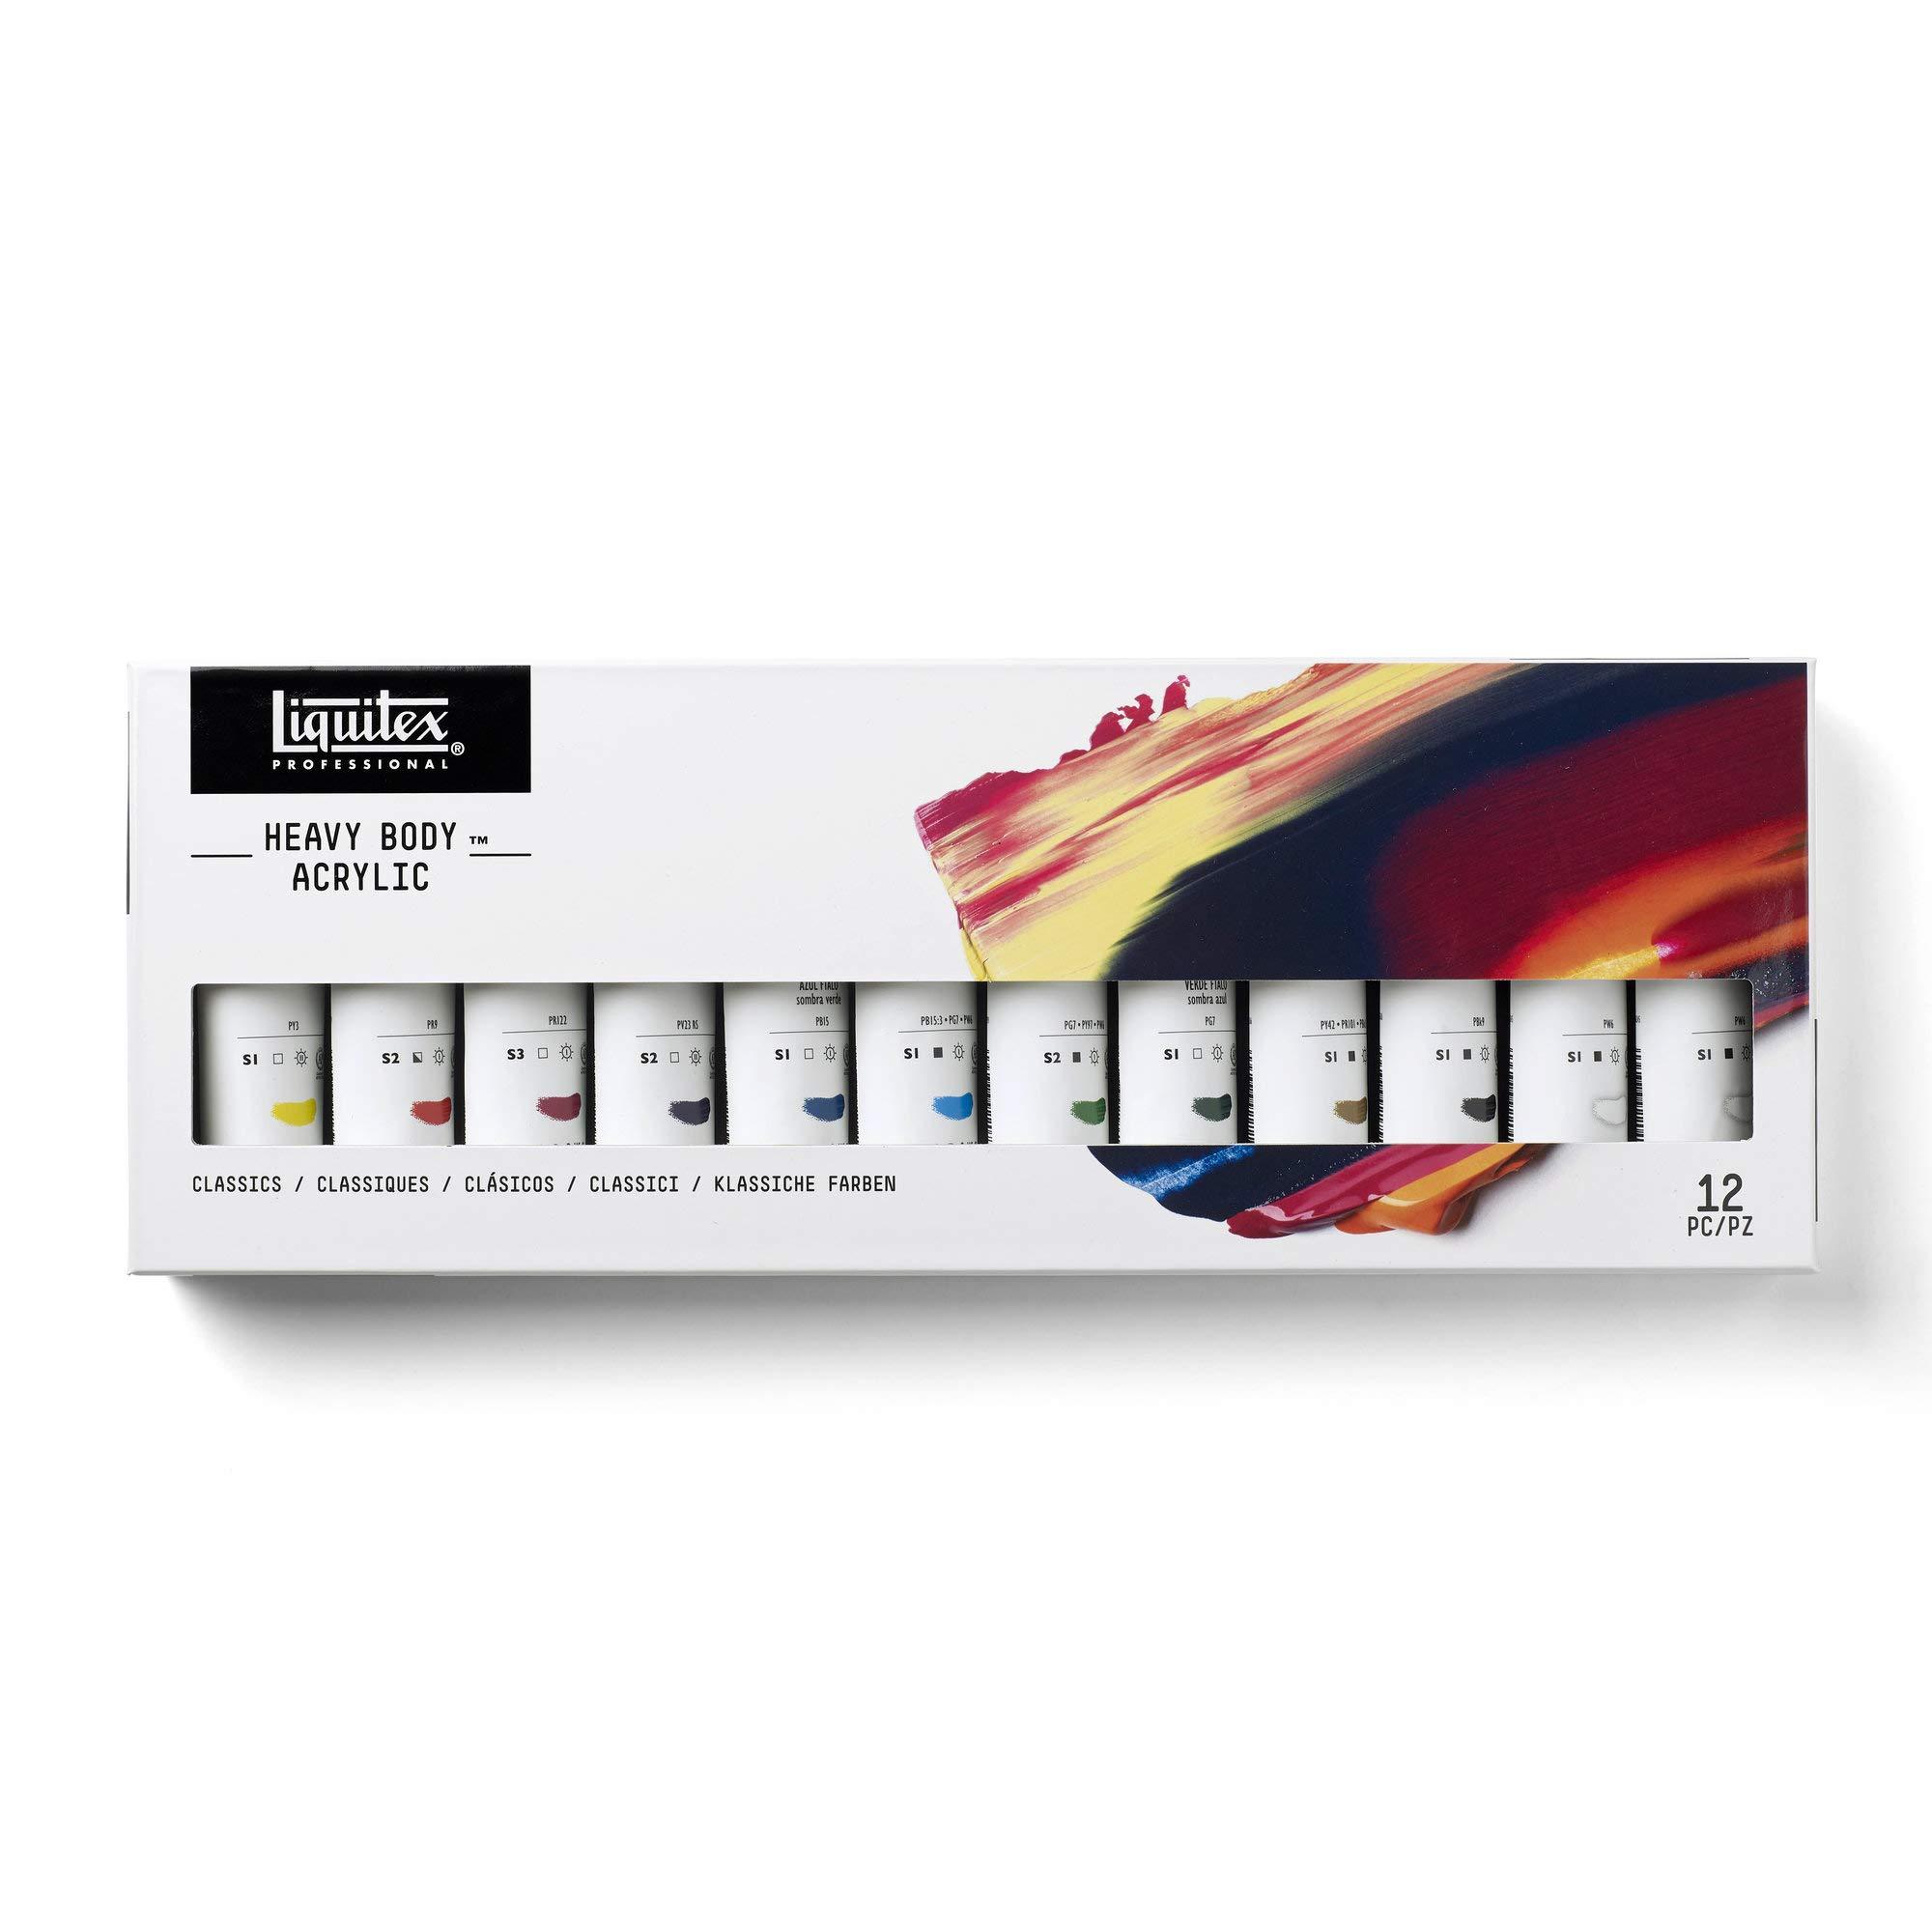 Liquitex Professional Heavy Body Acrylic Paint Classic Set, 12 Colors by Liquitex